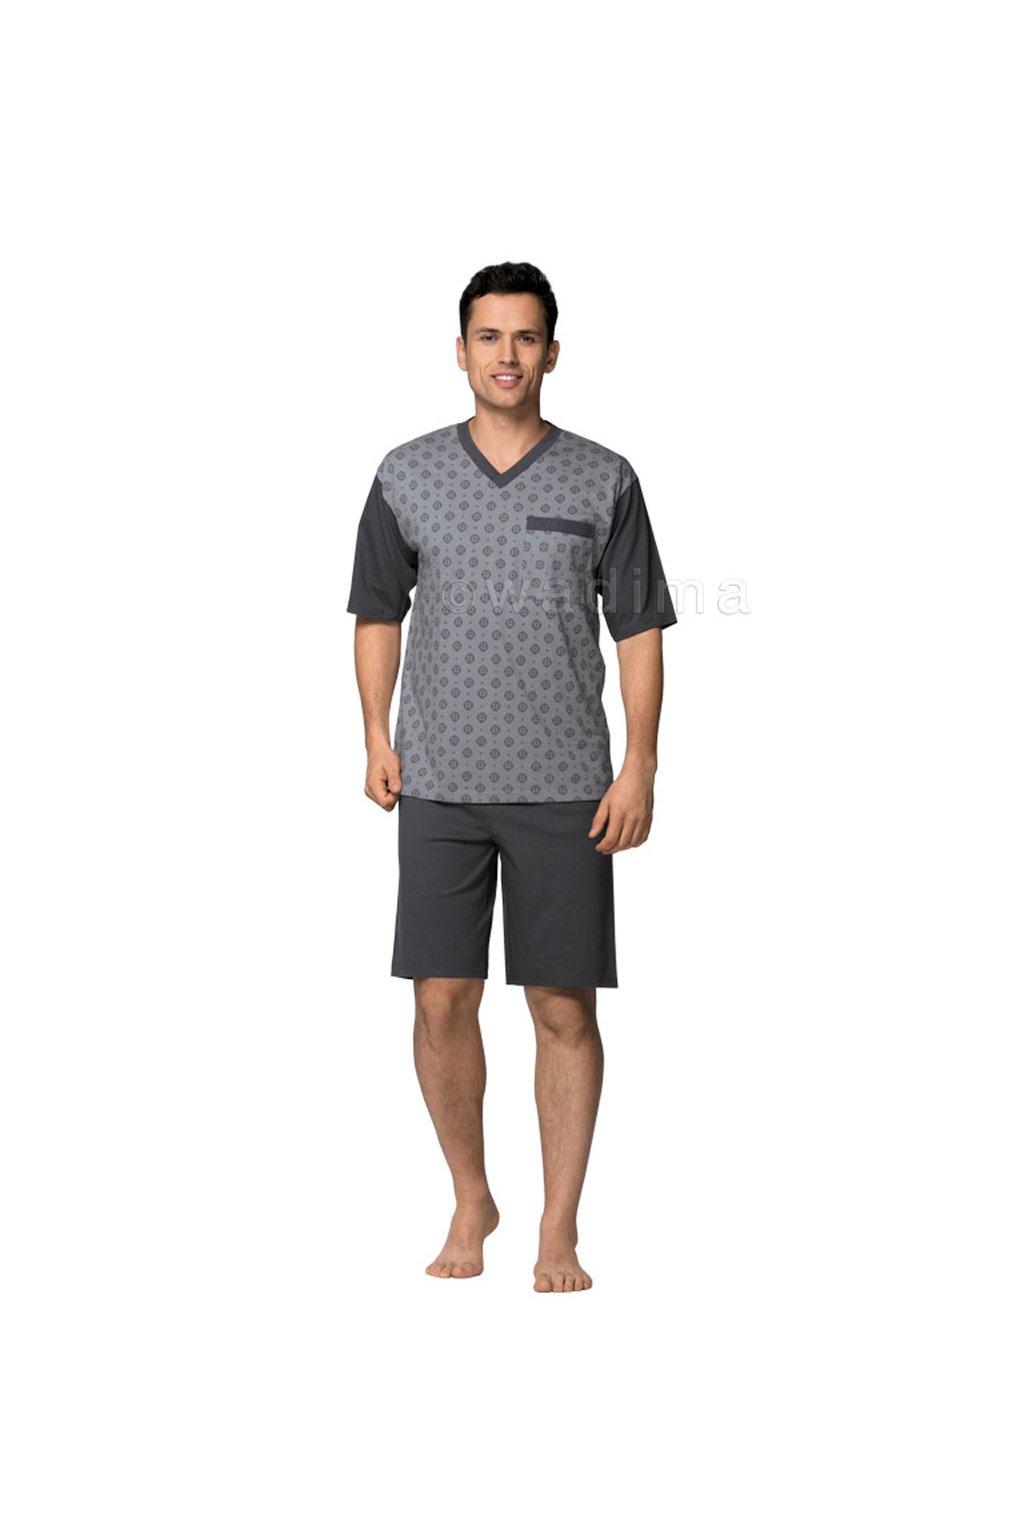 Pánské pyžamo s krátkým rukávem, 204ERNESTk 779, šedá